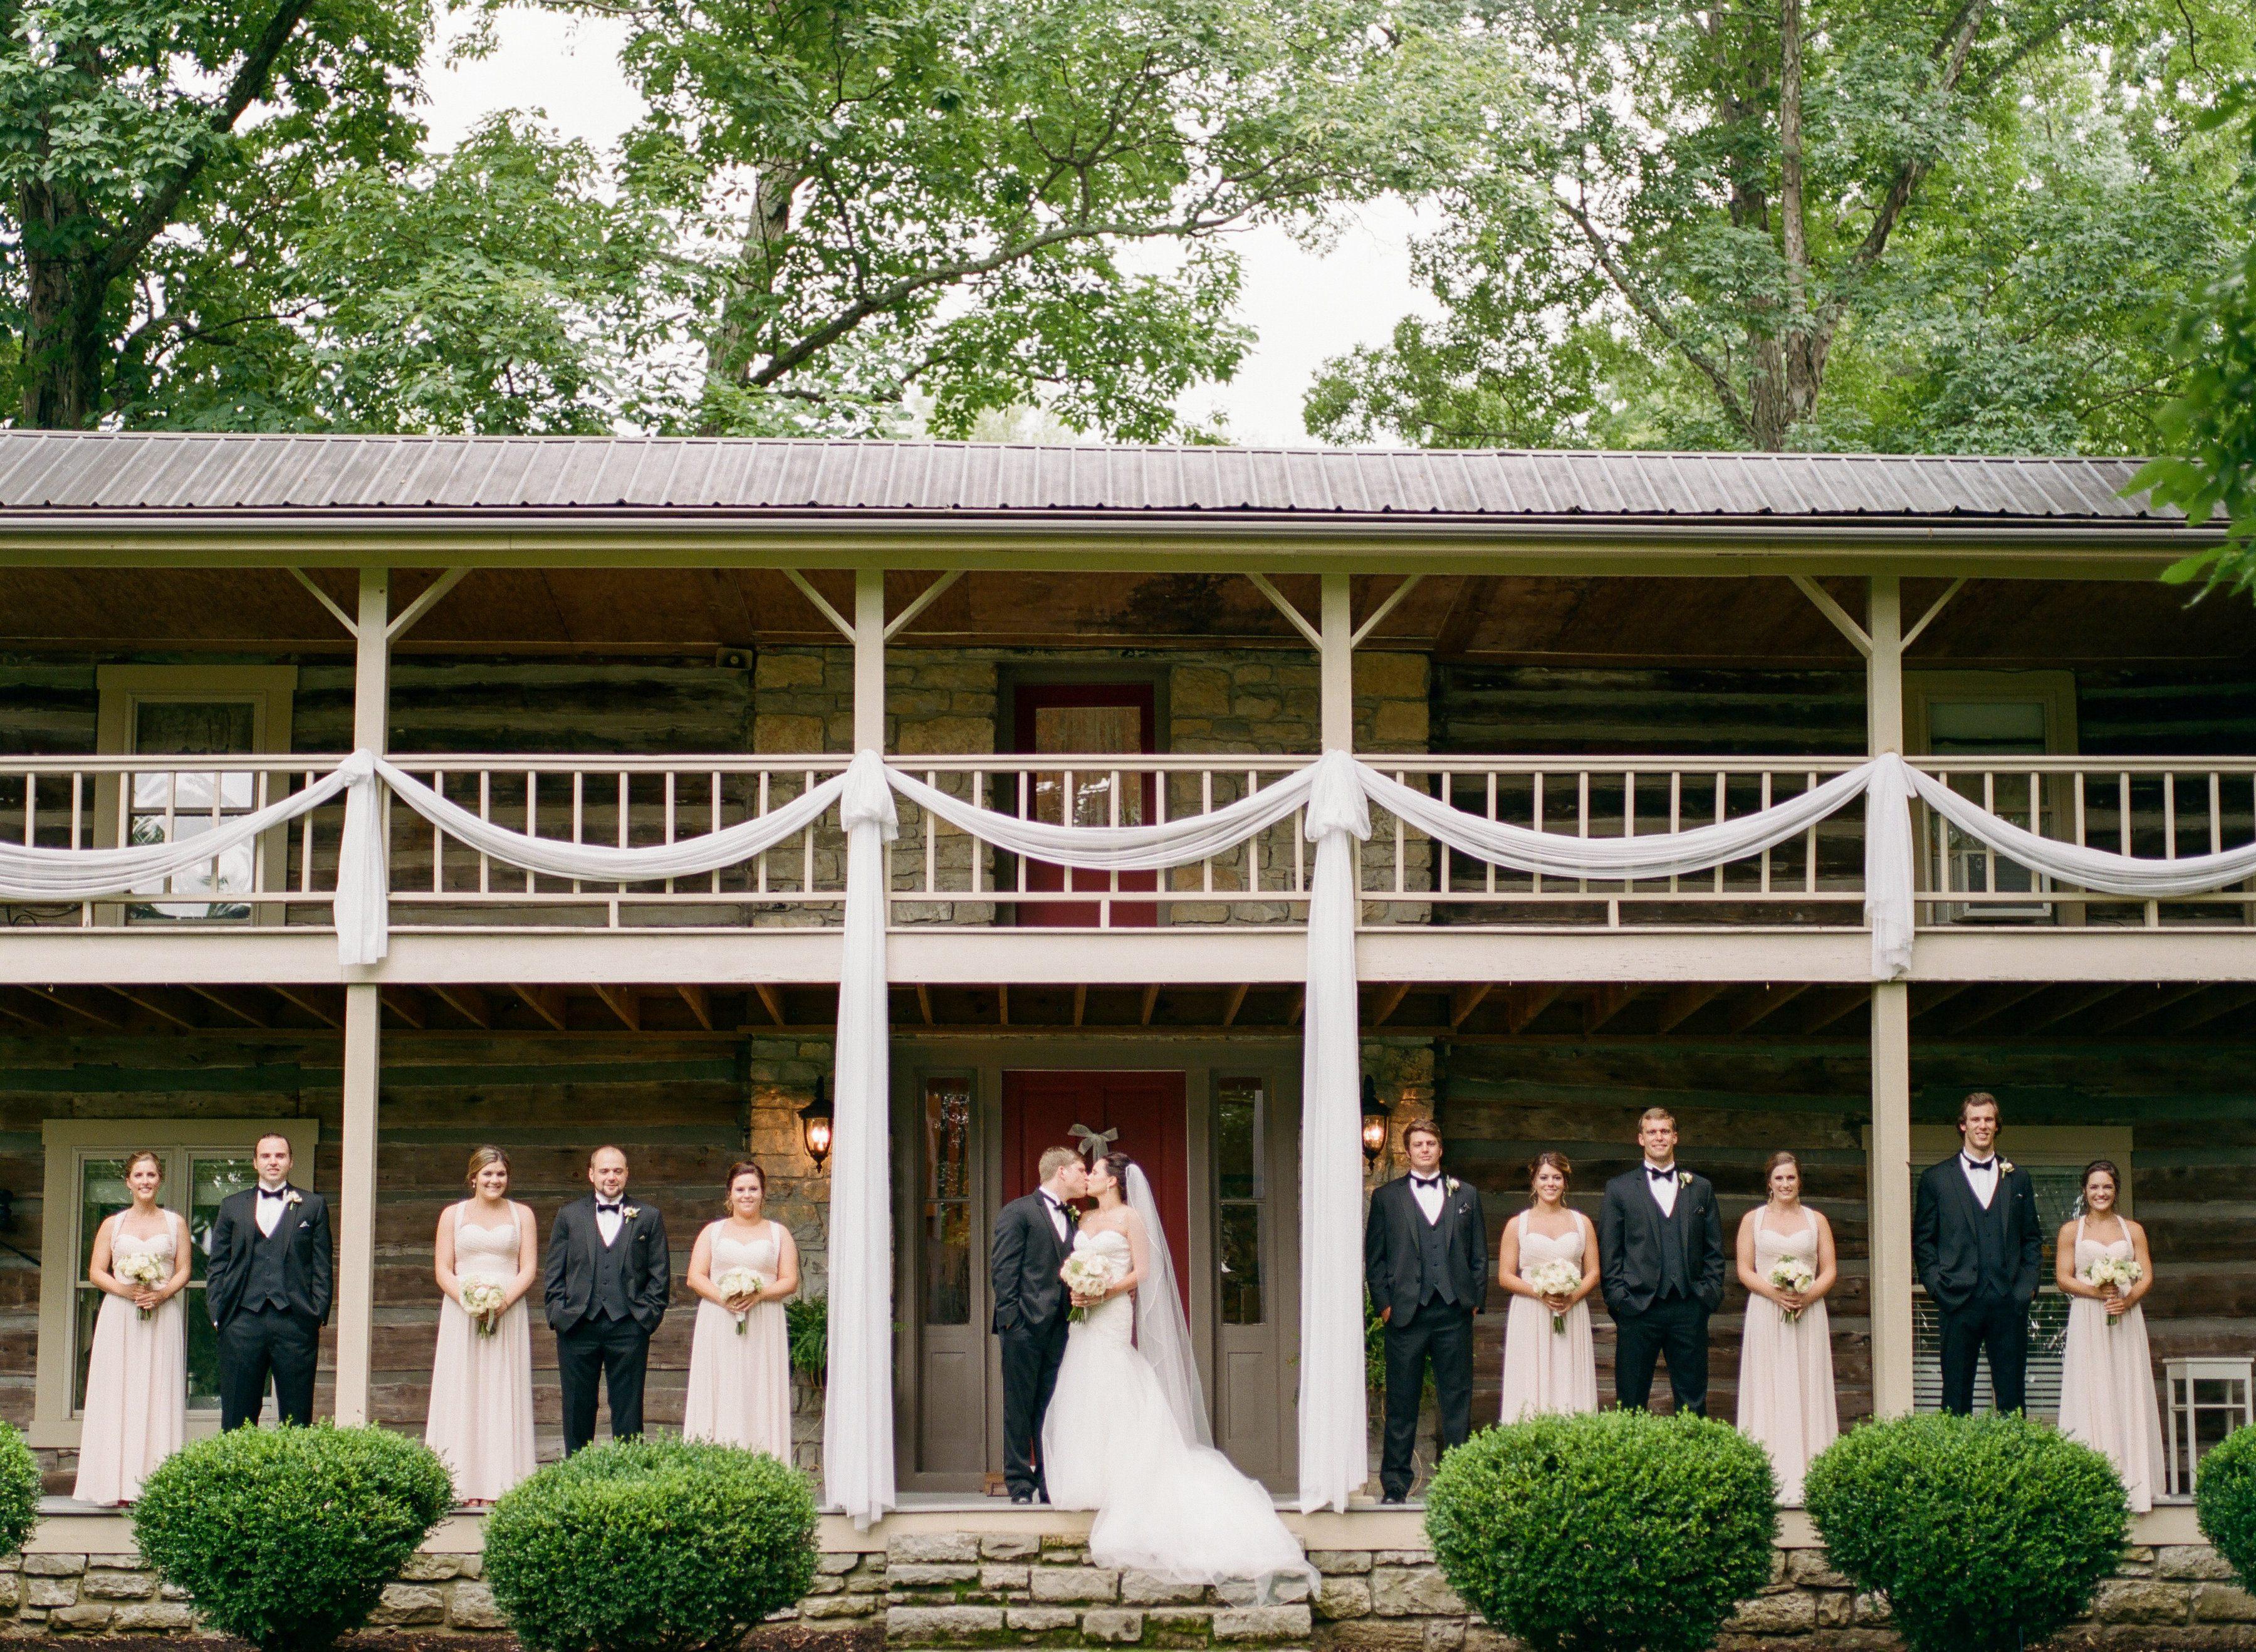 Iriswoods Wedding and Events Venue